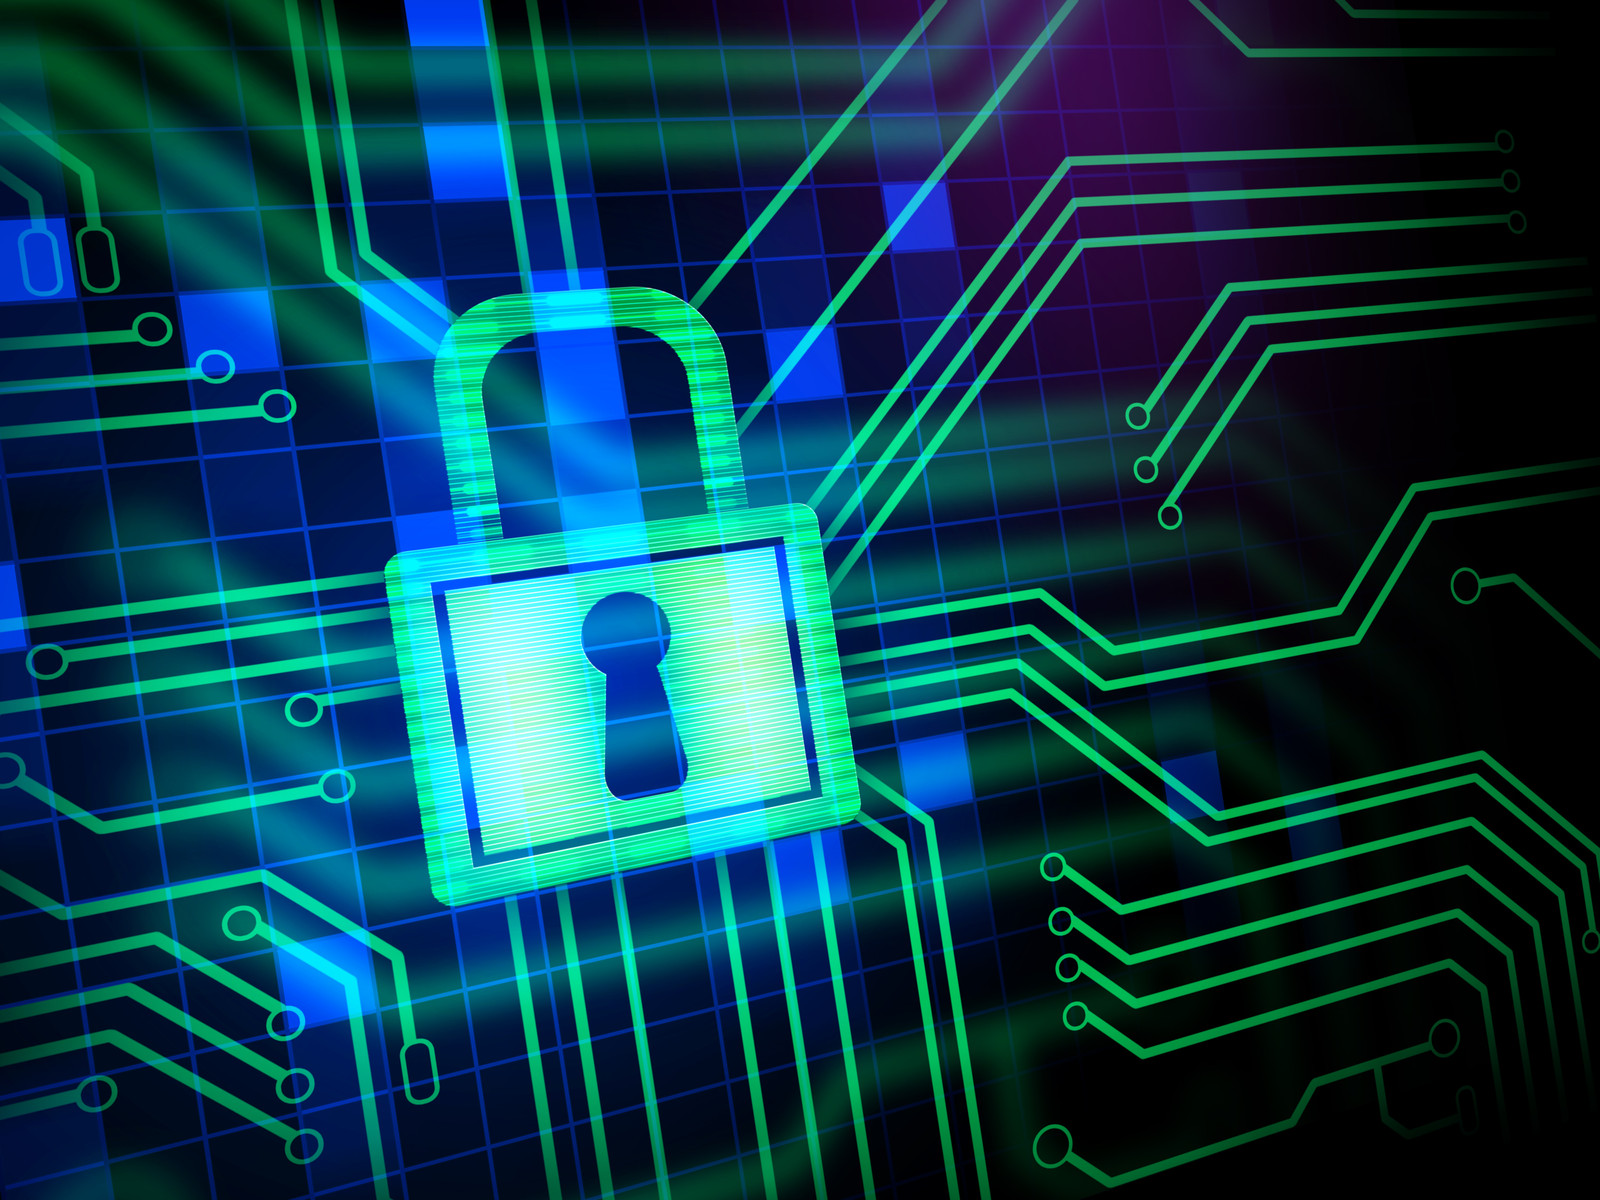 Print Security in the IoT Era